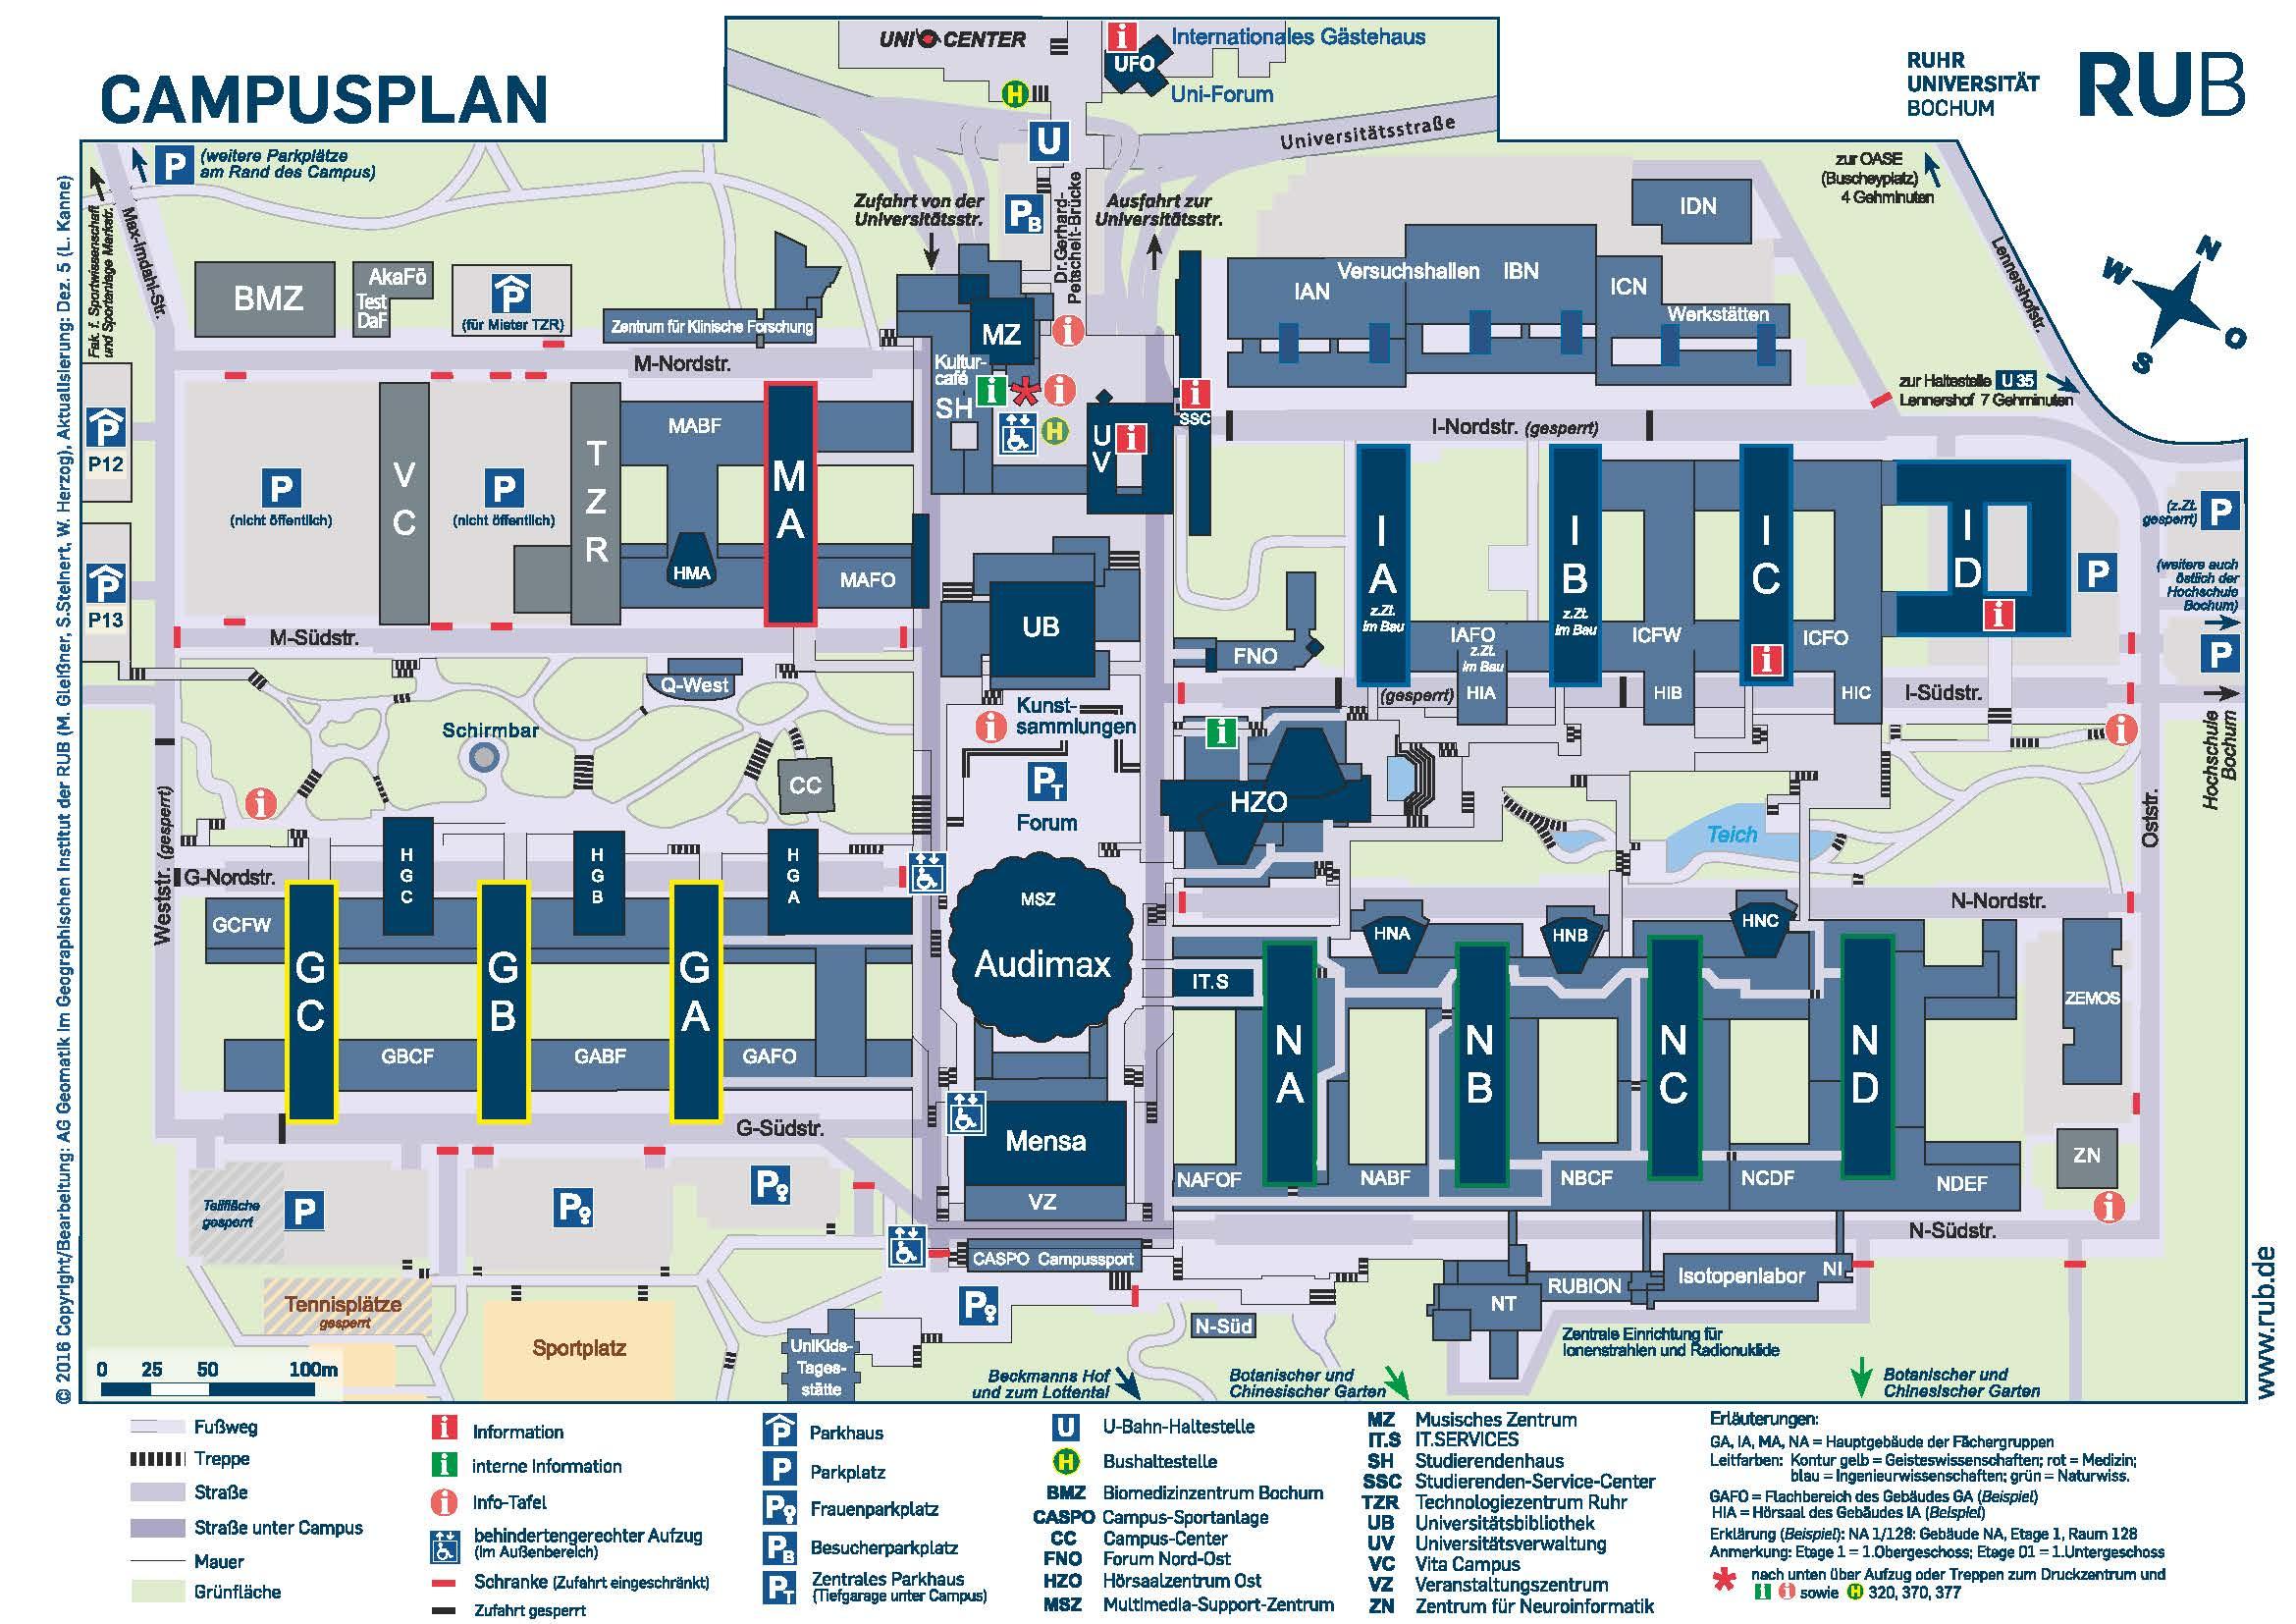 Lageplan Ruhruni Bochum